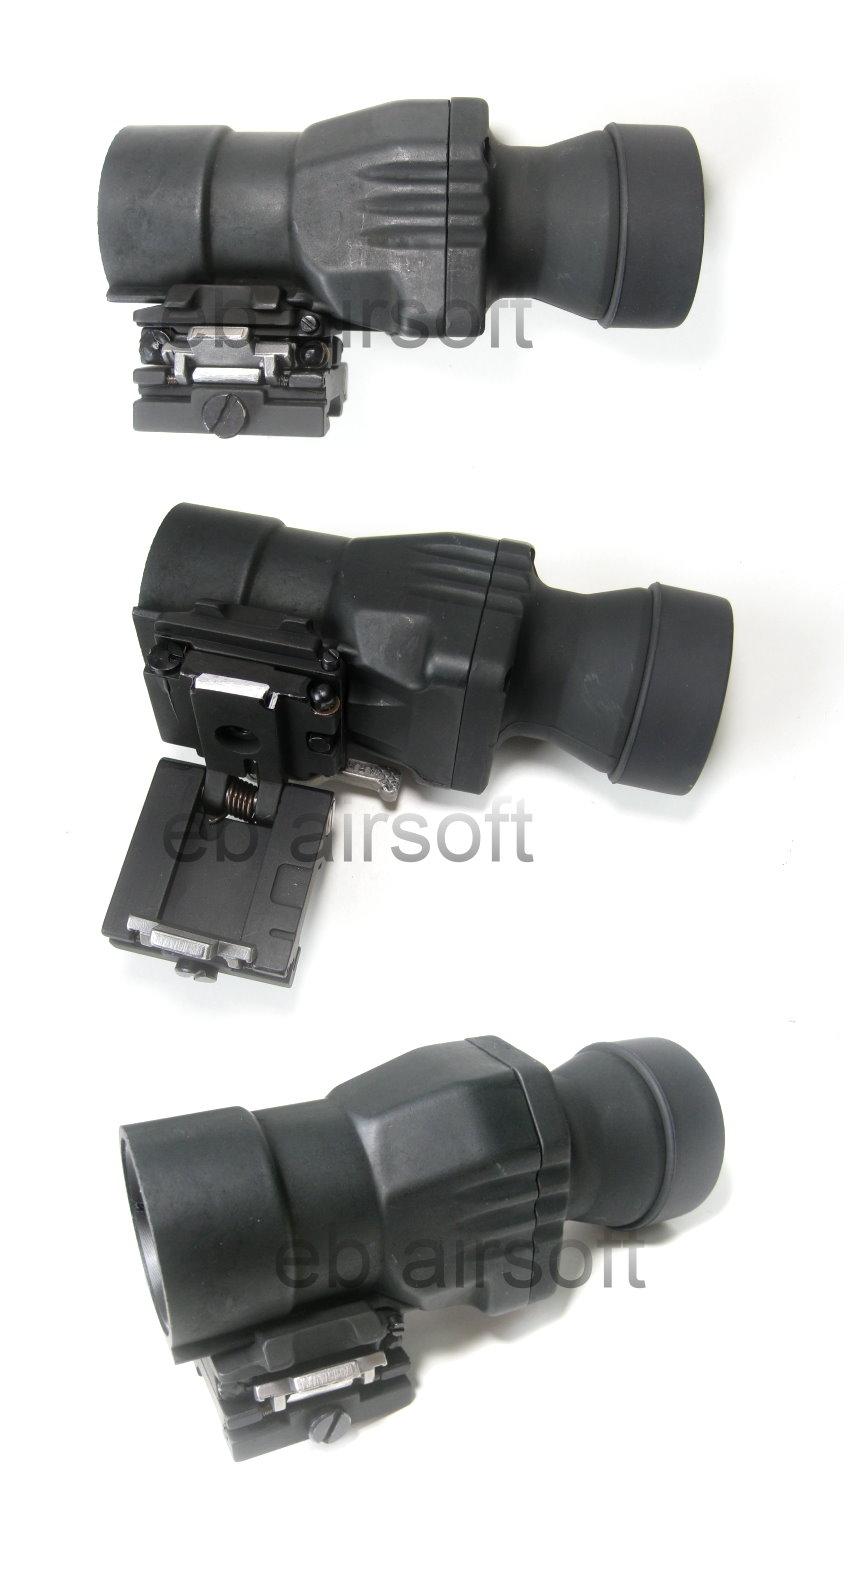 Black dress 4x magnifiers